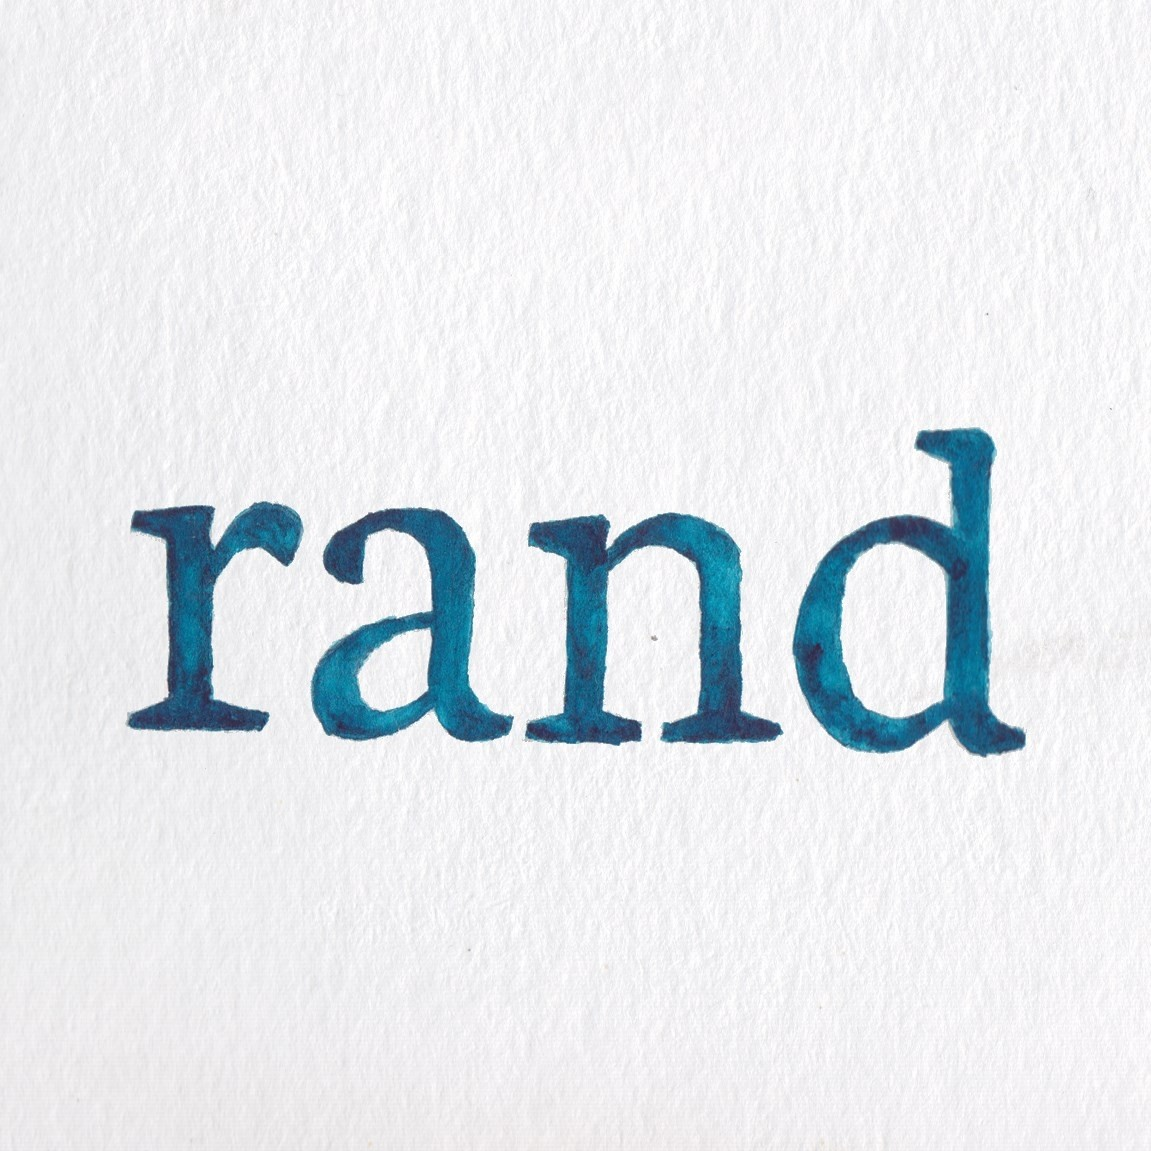 Rand Moroc & Coffee